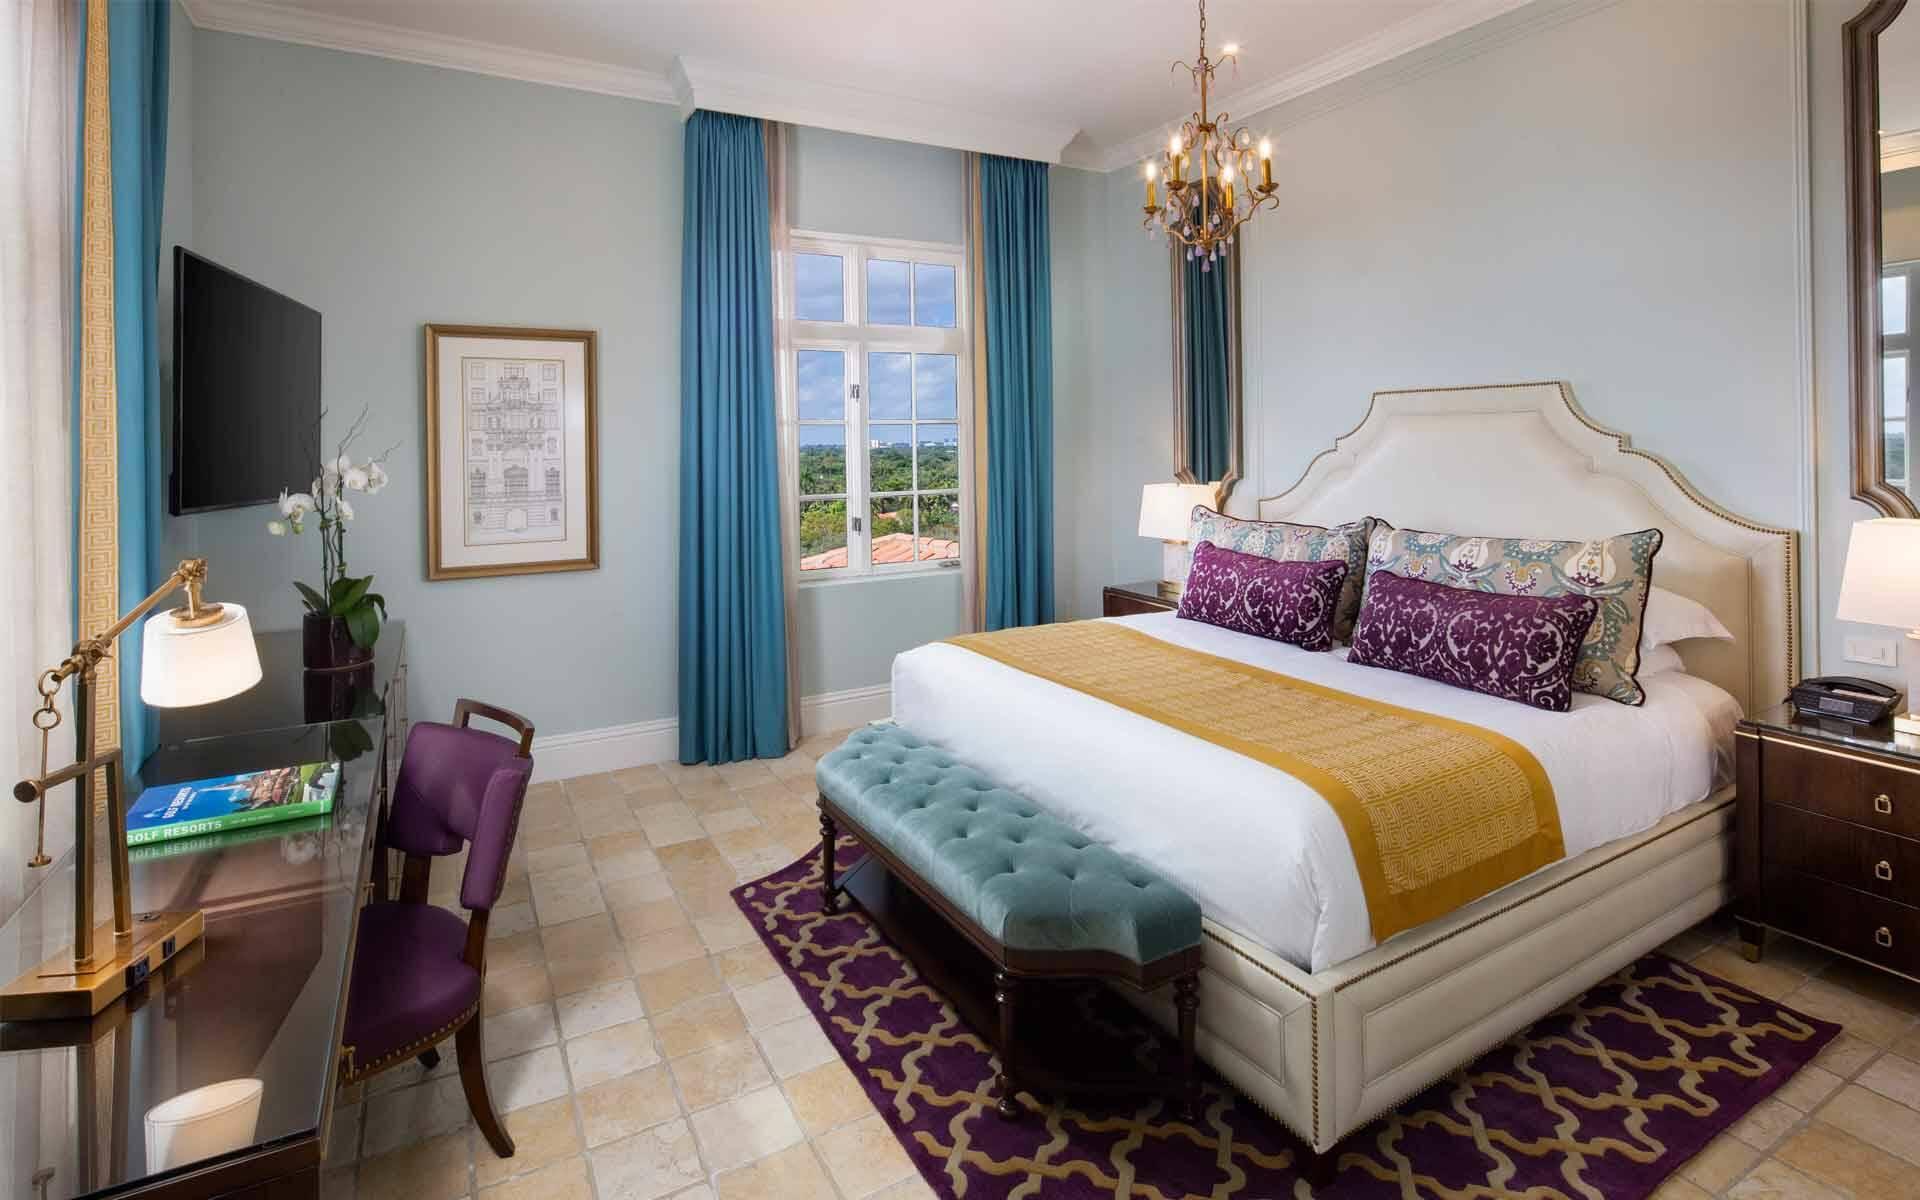 Biltmore King Suite One Bedroom Miami